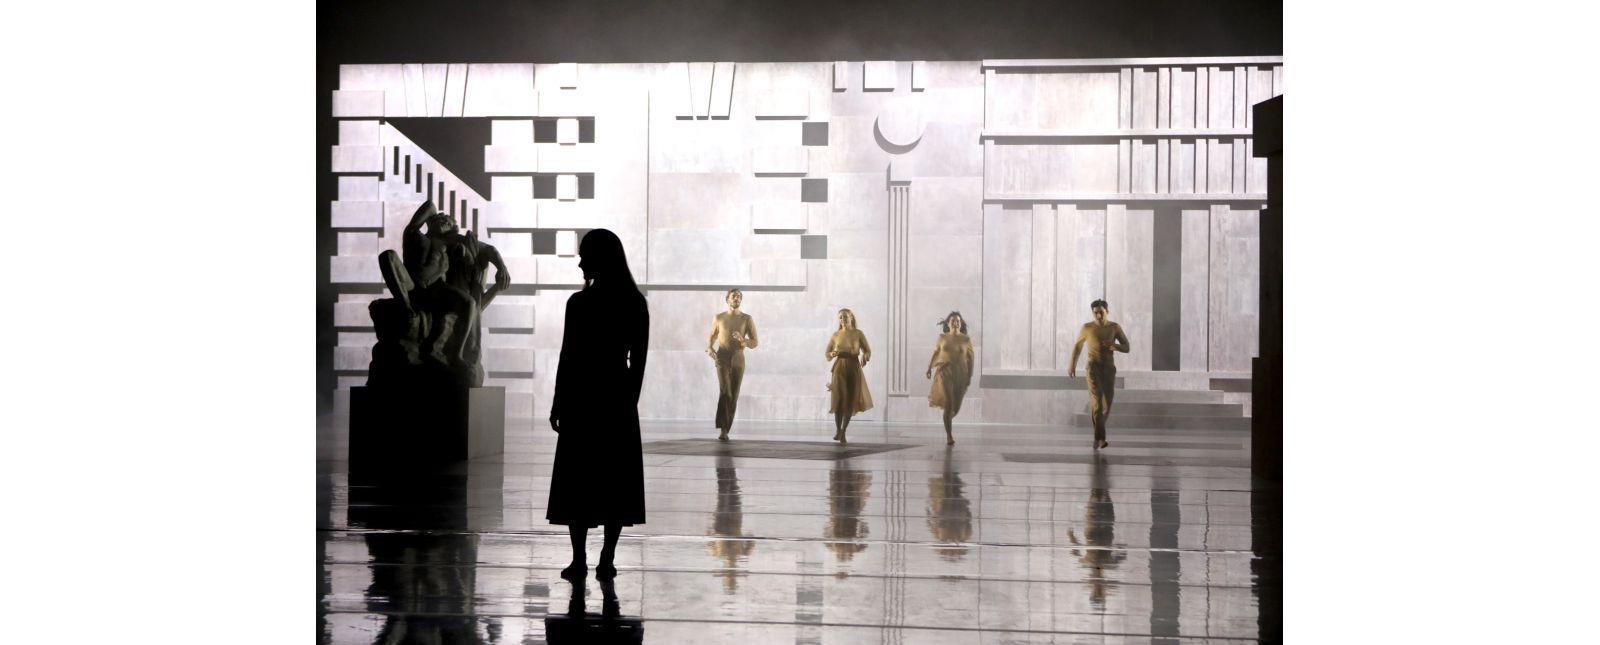 Der Widerspenstigen Zähmung // Alona Szostak / Thieß Brammer / Aleksandra Cwen / Laura Angelina Palacios / Lukas Hupfeld // 2020 // Birgit Hupfeld